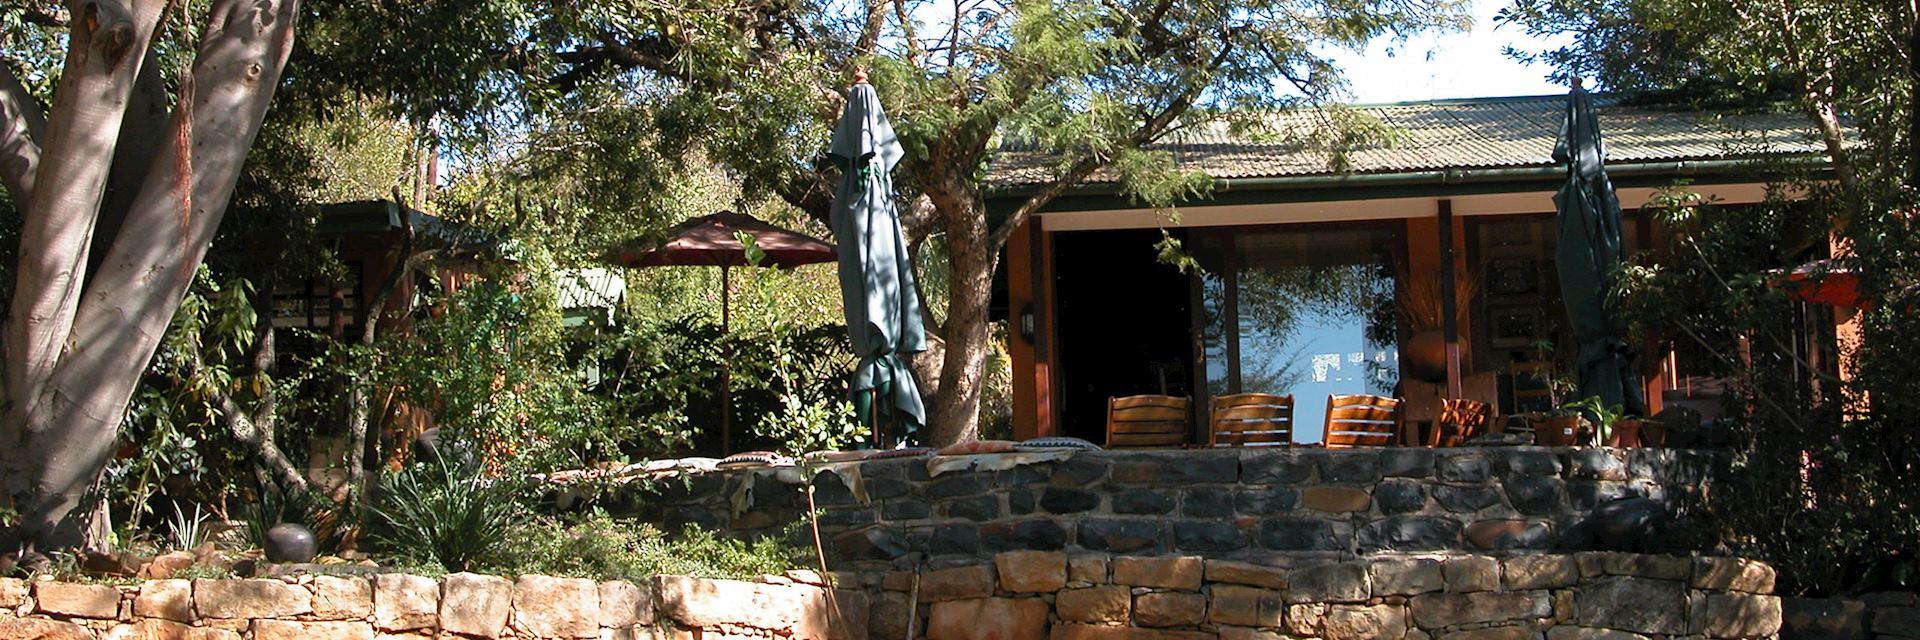 Fugitive Drift Lodge, South Africa